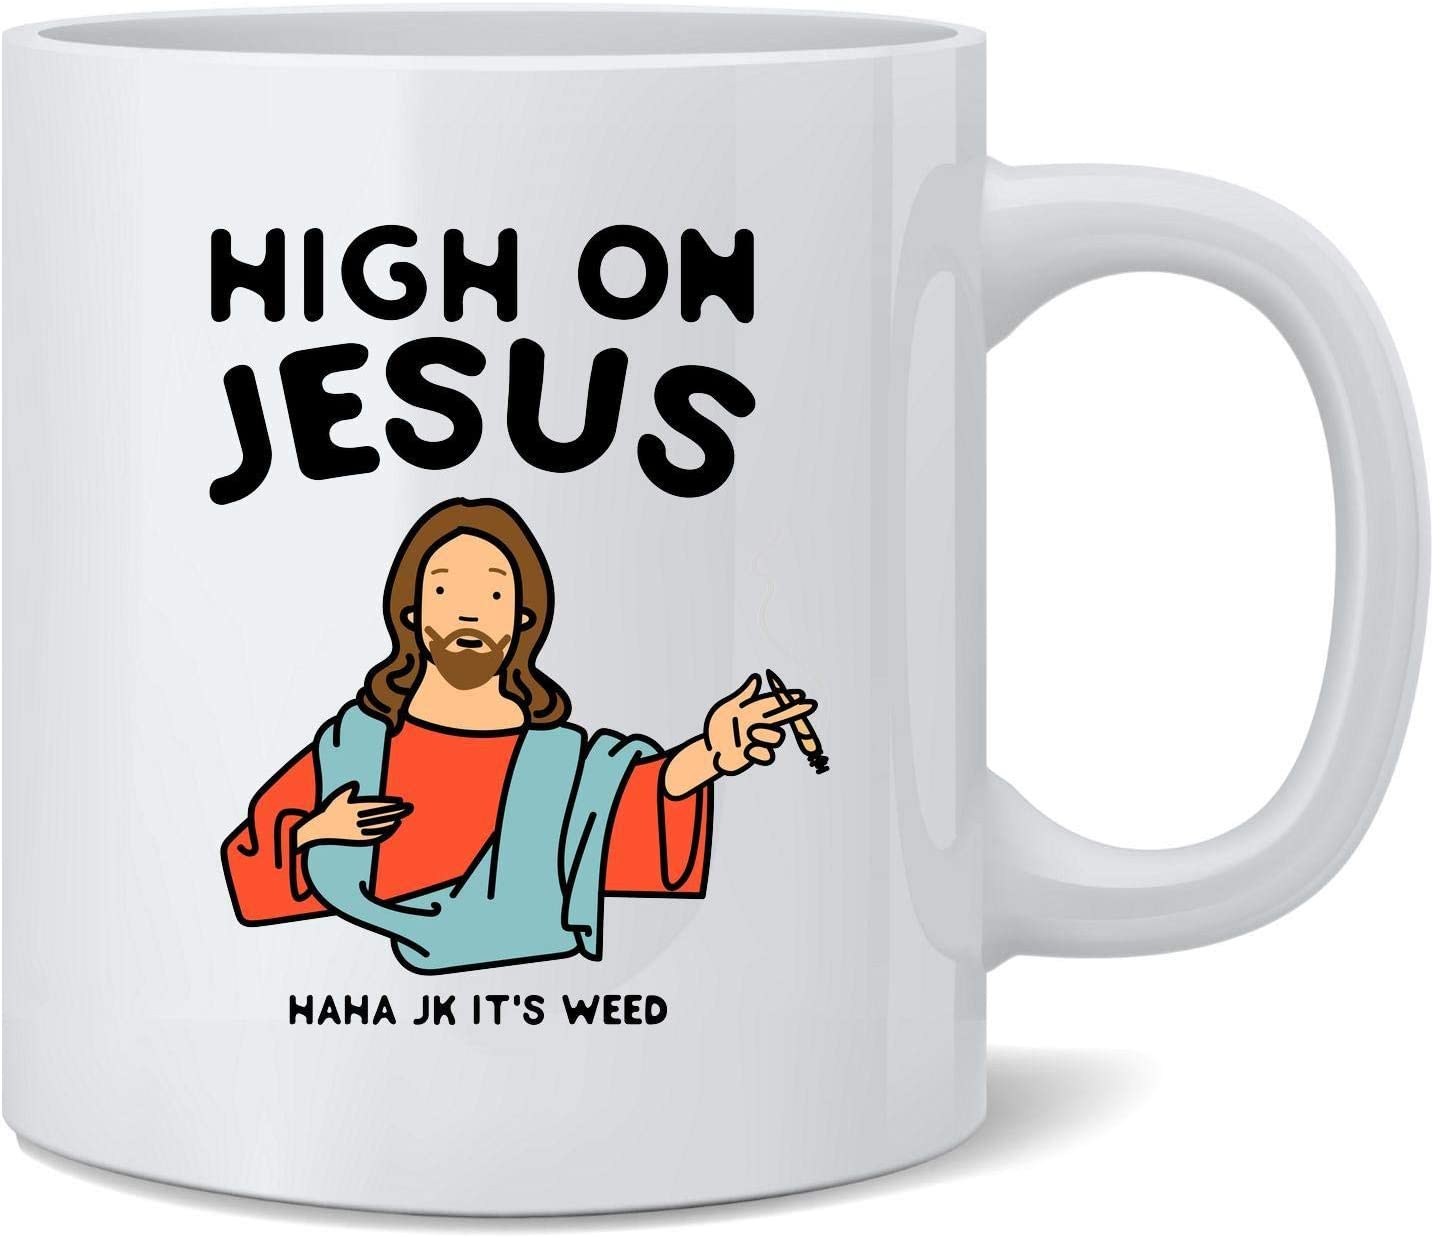 High On Jesus (JK Its Weed) Funny Marijuana Pot Ceramic Coffee Mug Tea Cup Fun Novelty Gift 12 oz